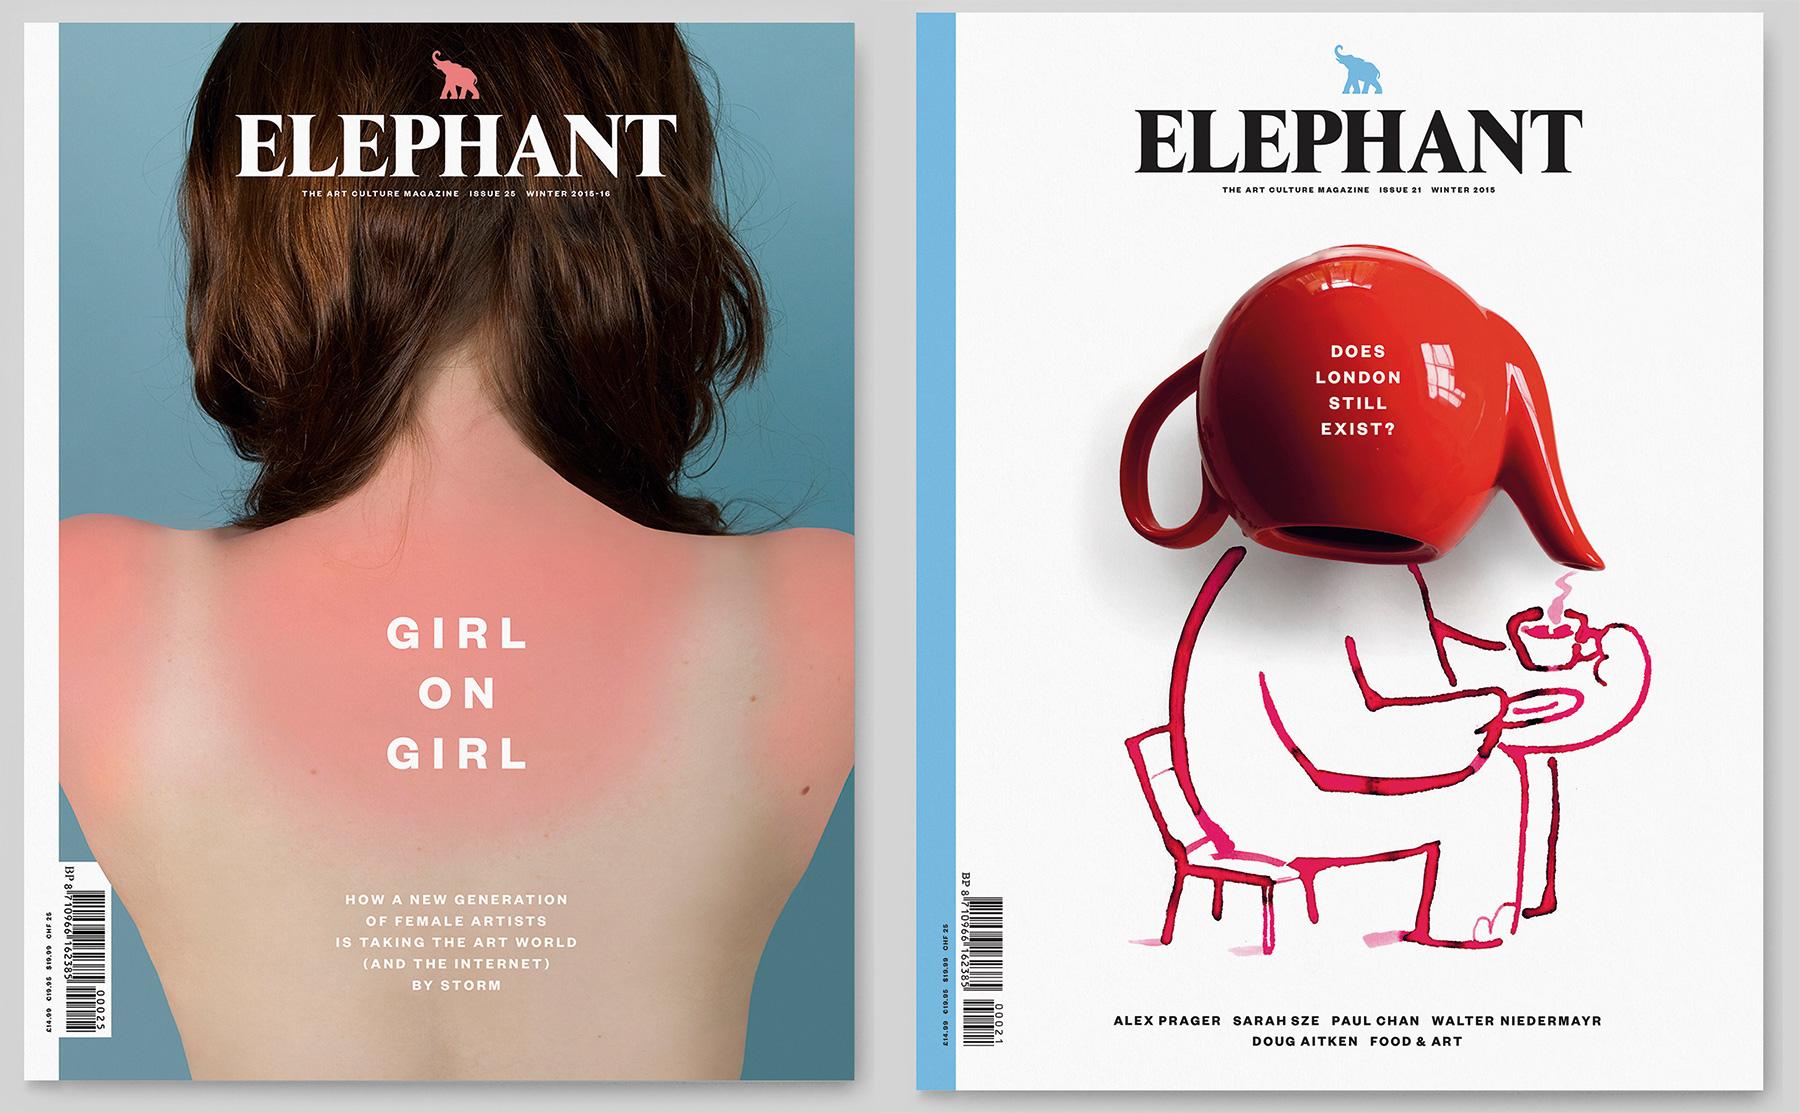 Astrid Stavro: Elephant magazine